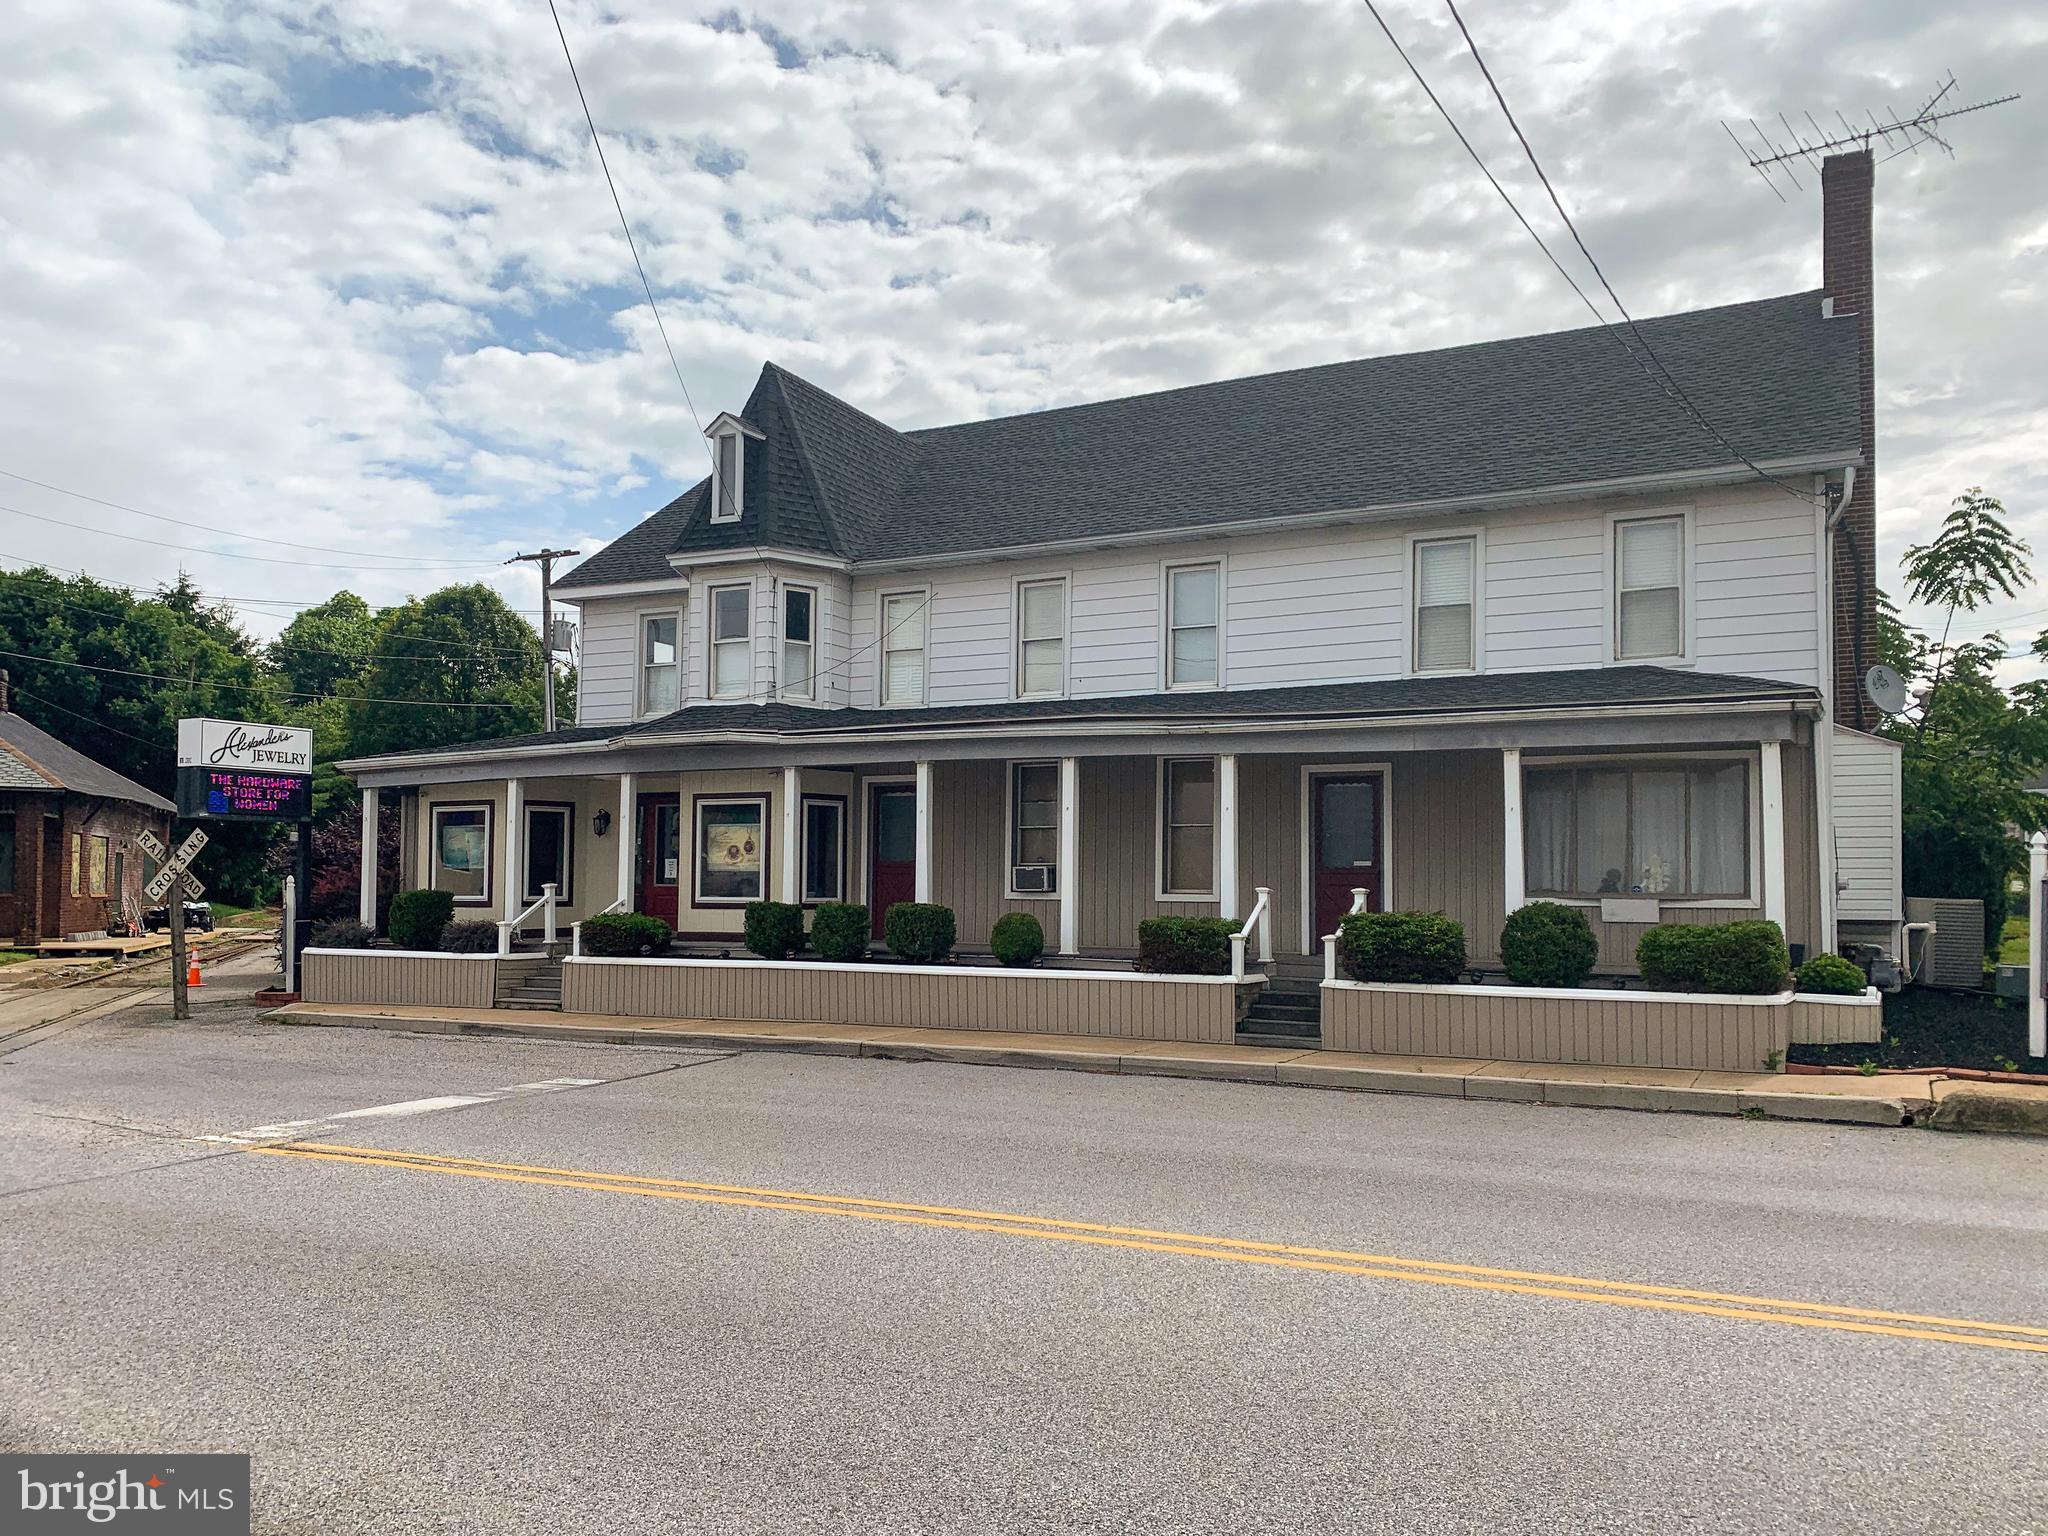 431-435 S MAIN STREET, SHREWSBURY, PA 17361